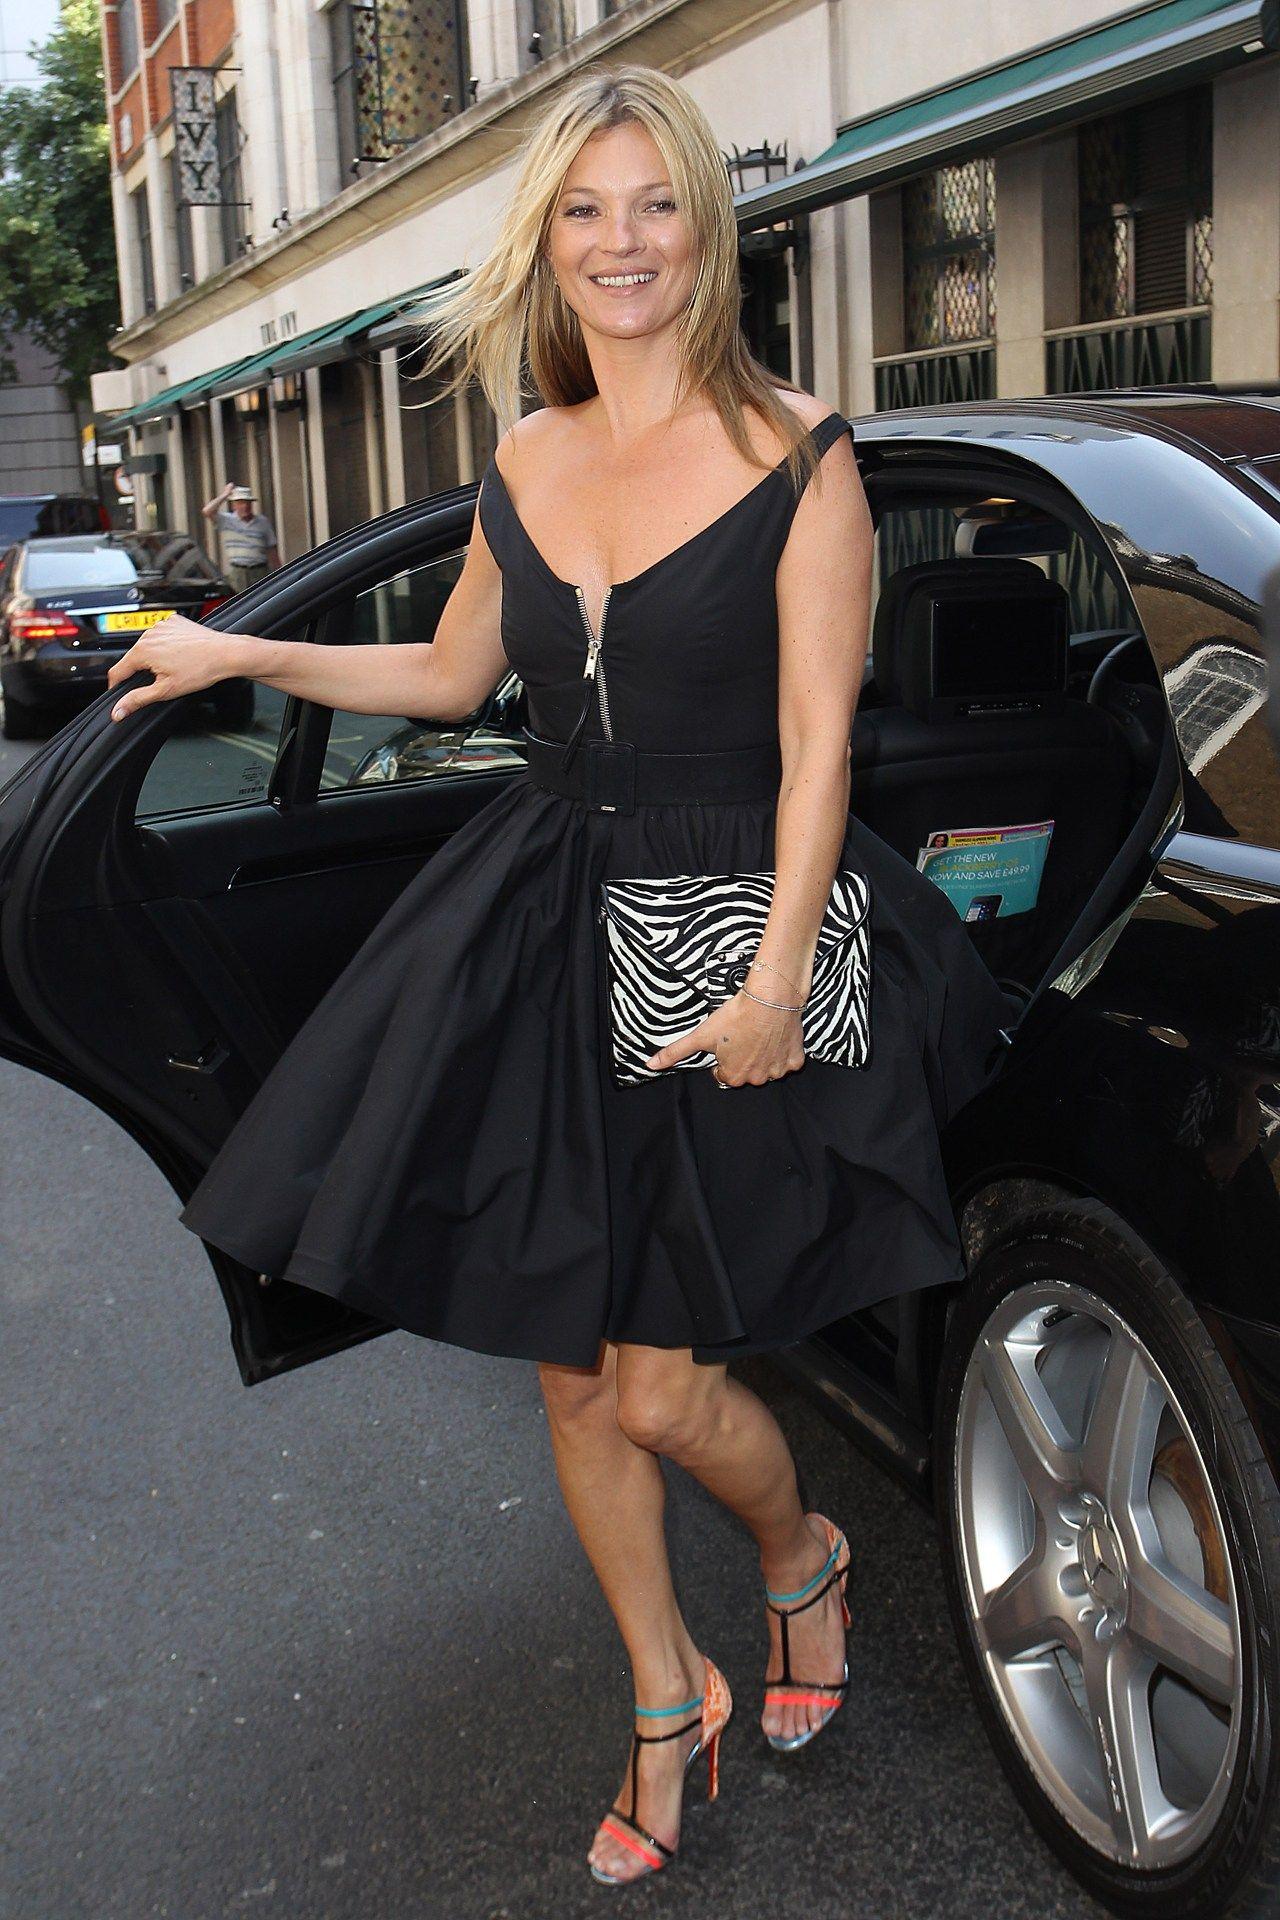 black dress/ cute, unique stripy heels